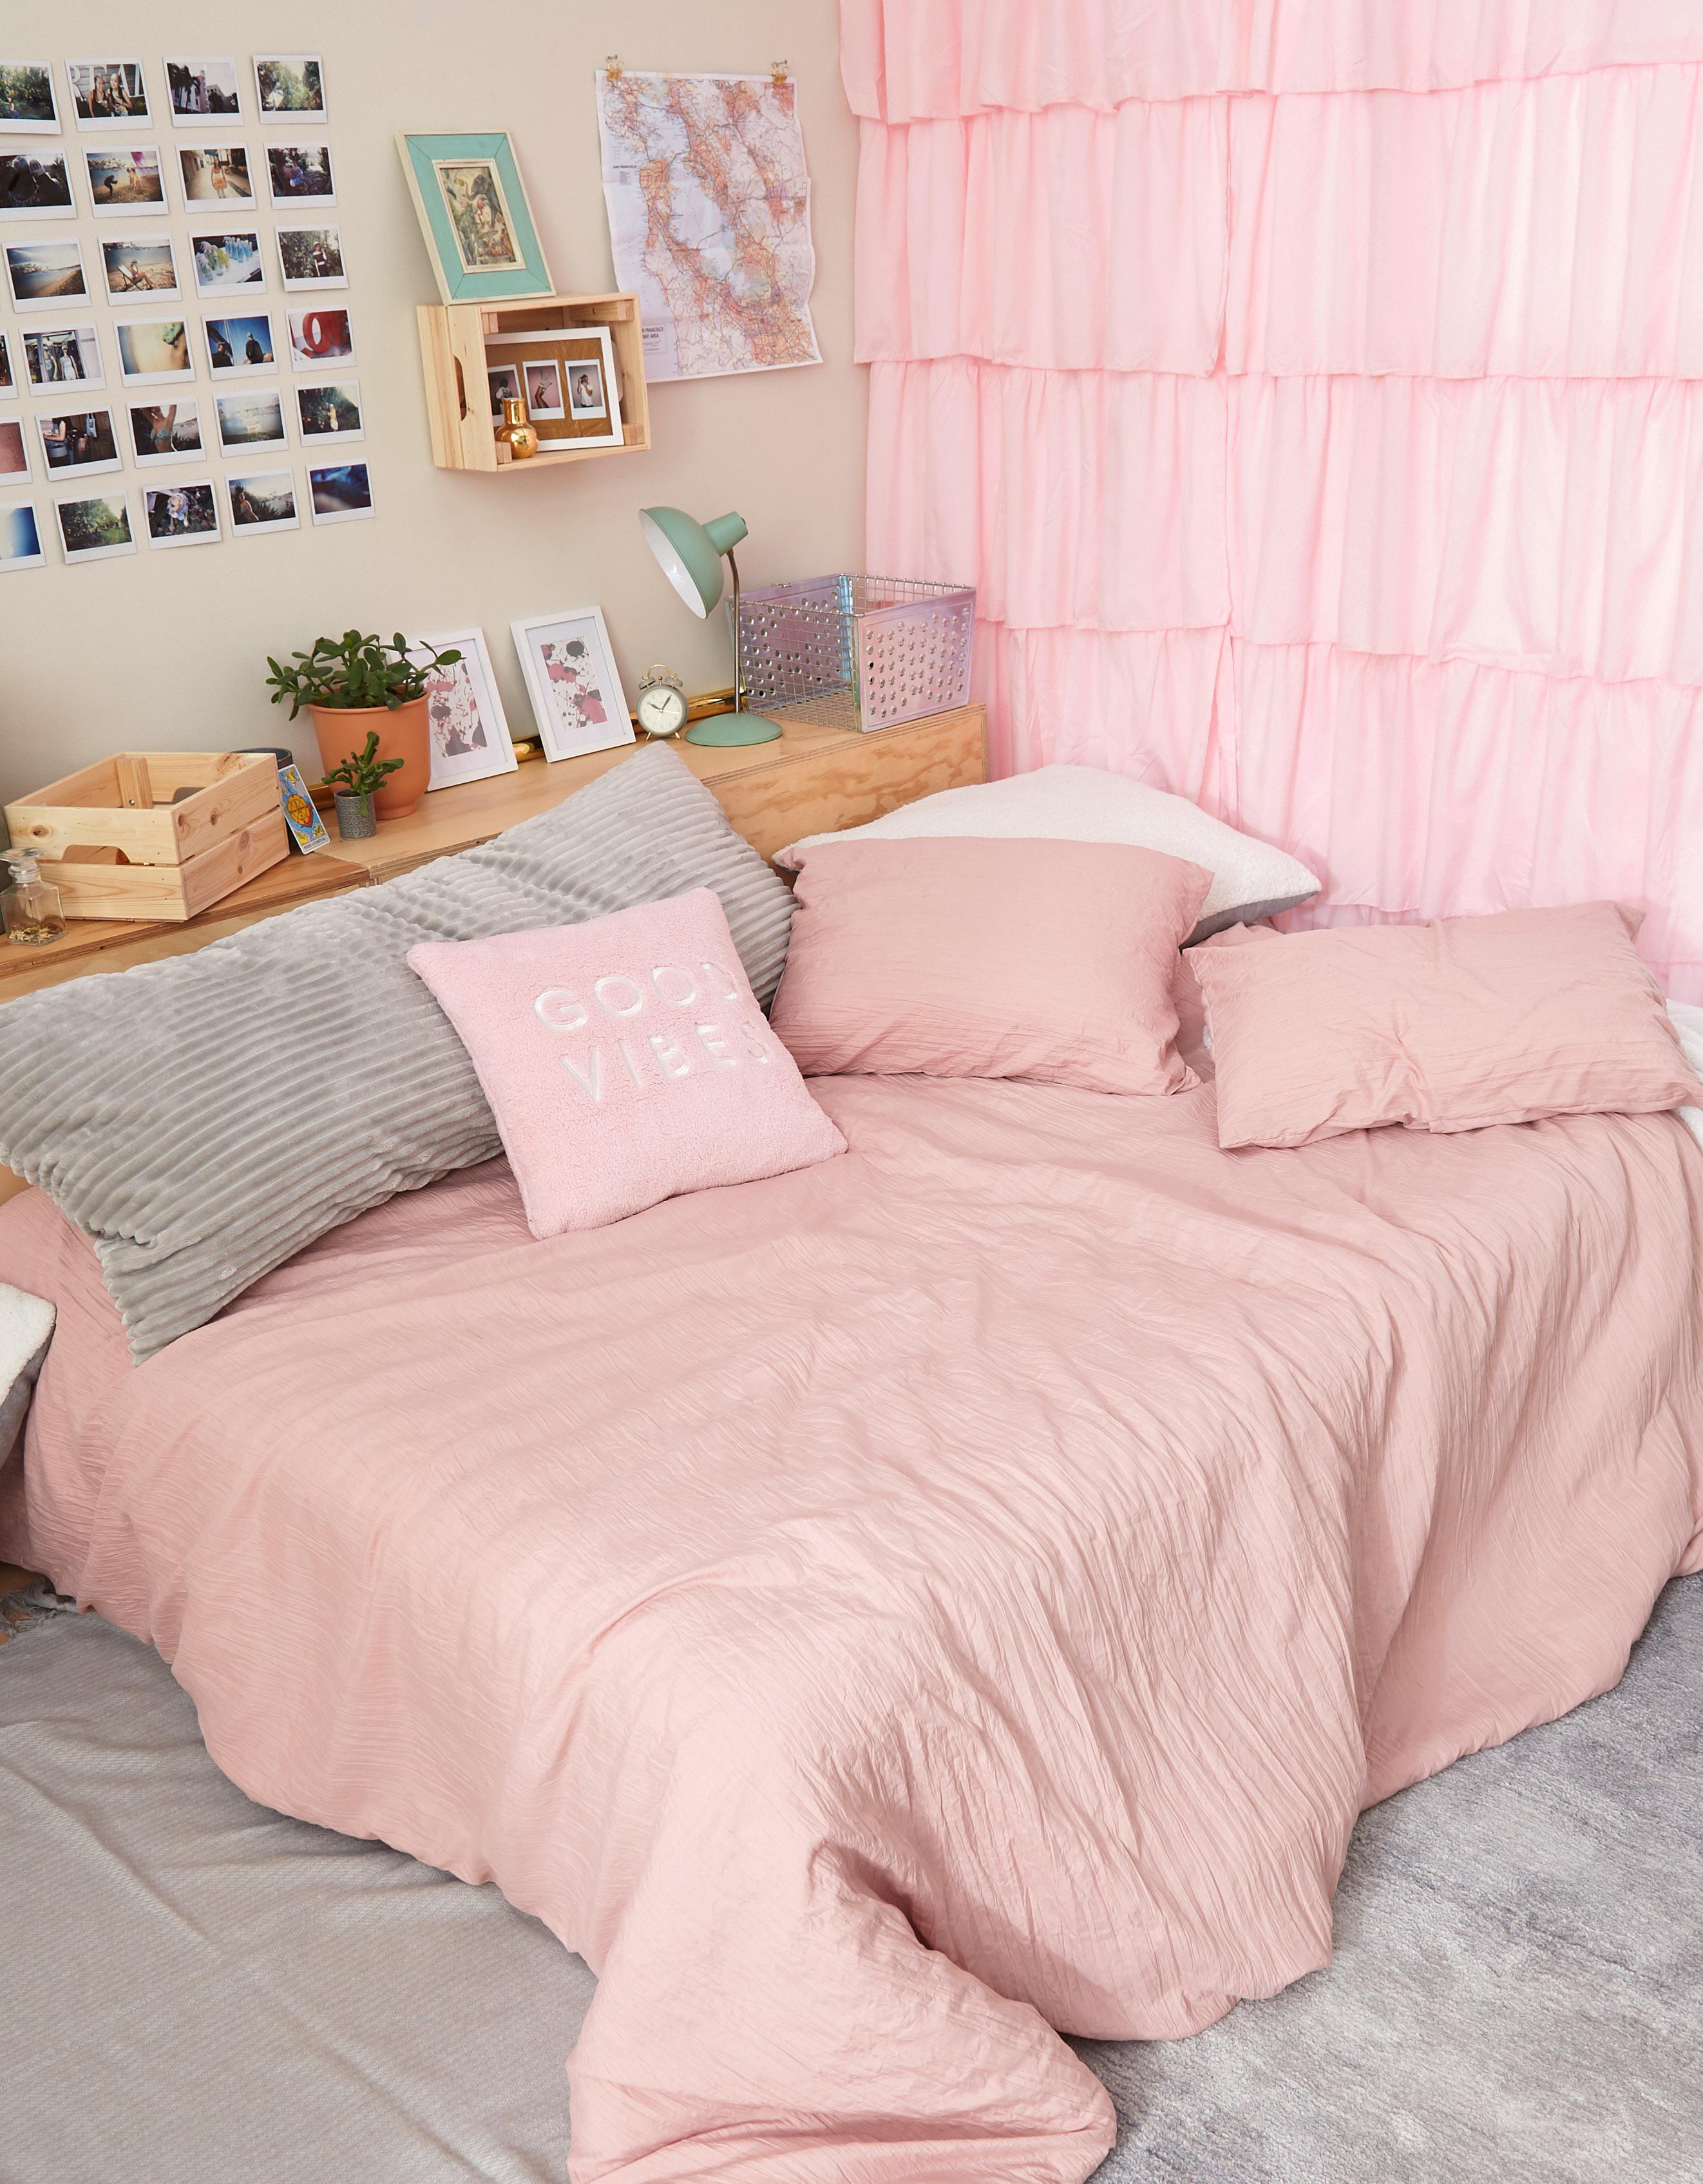 AE apartment & dorm decor